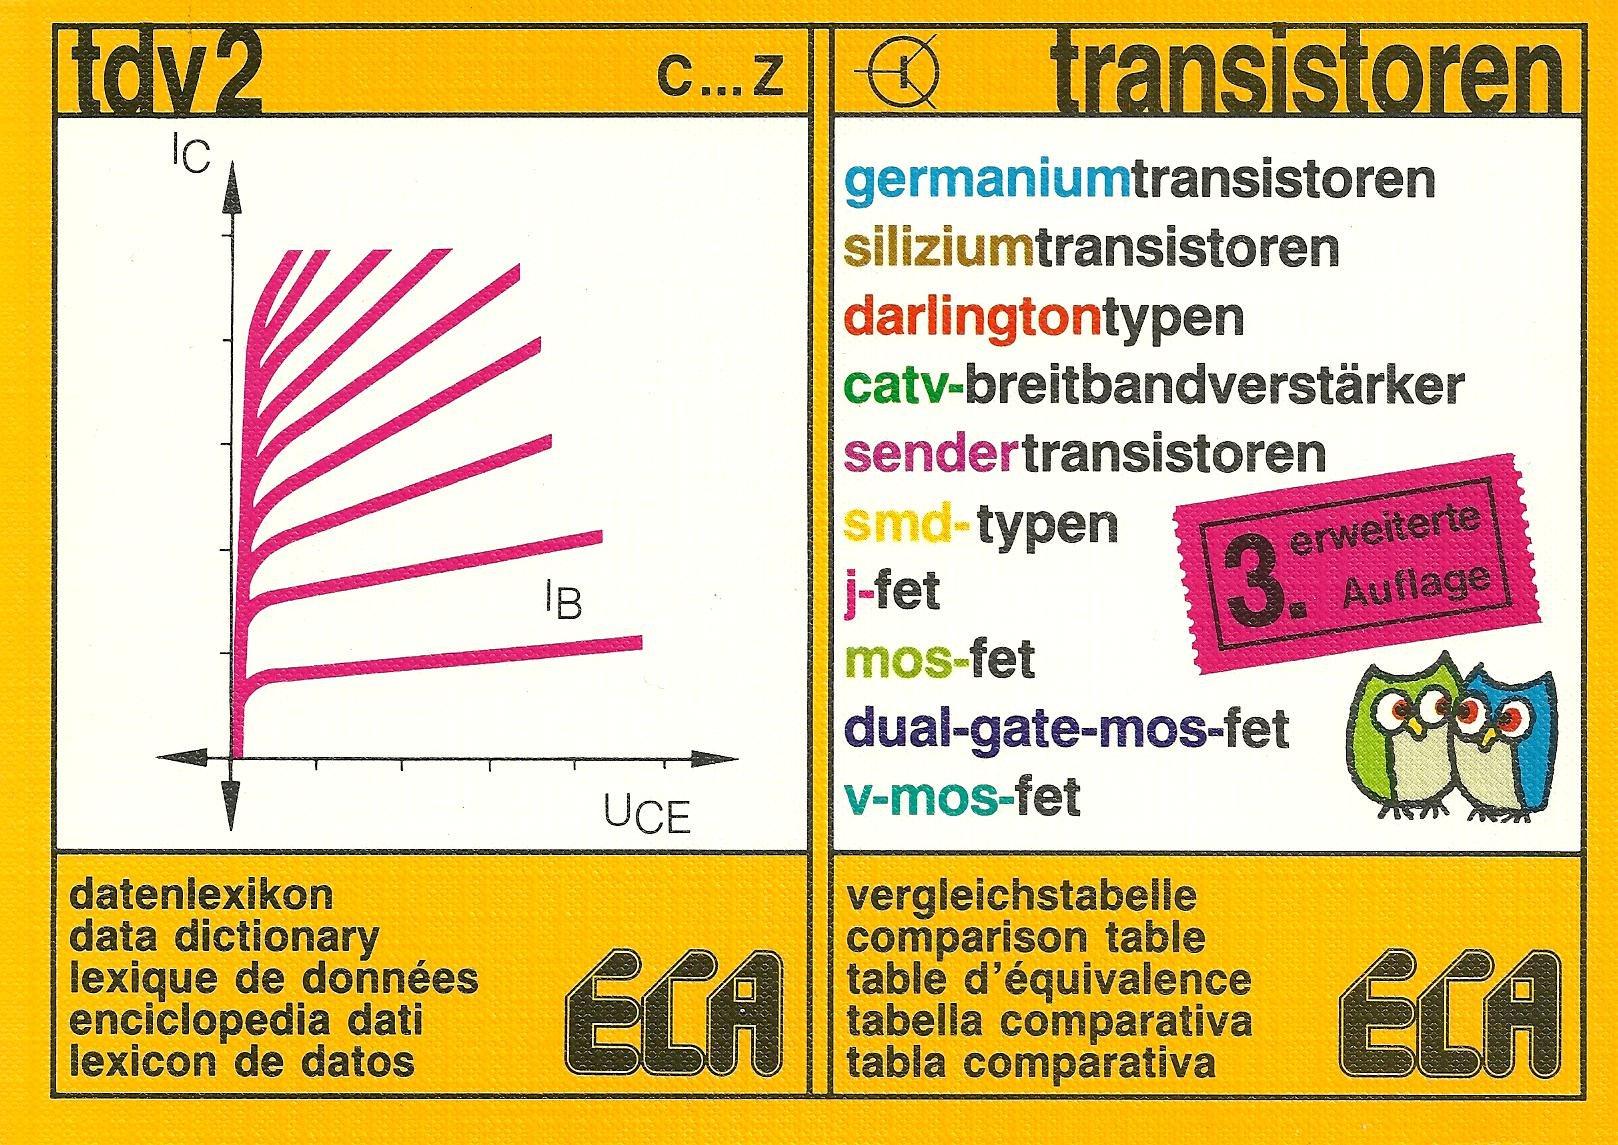 Tdv 2 Transistors 9783881090292 Books Dual Gate Mosfets